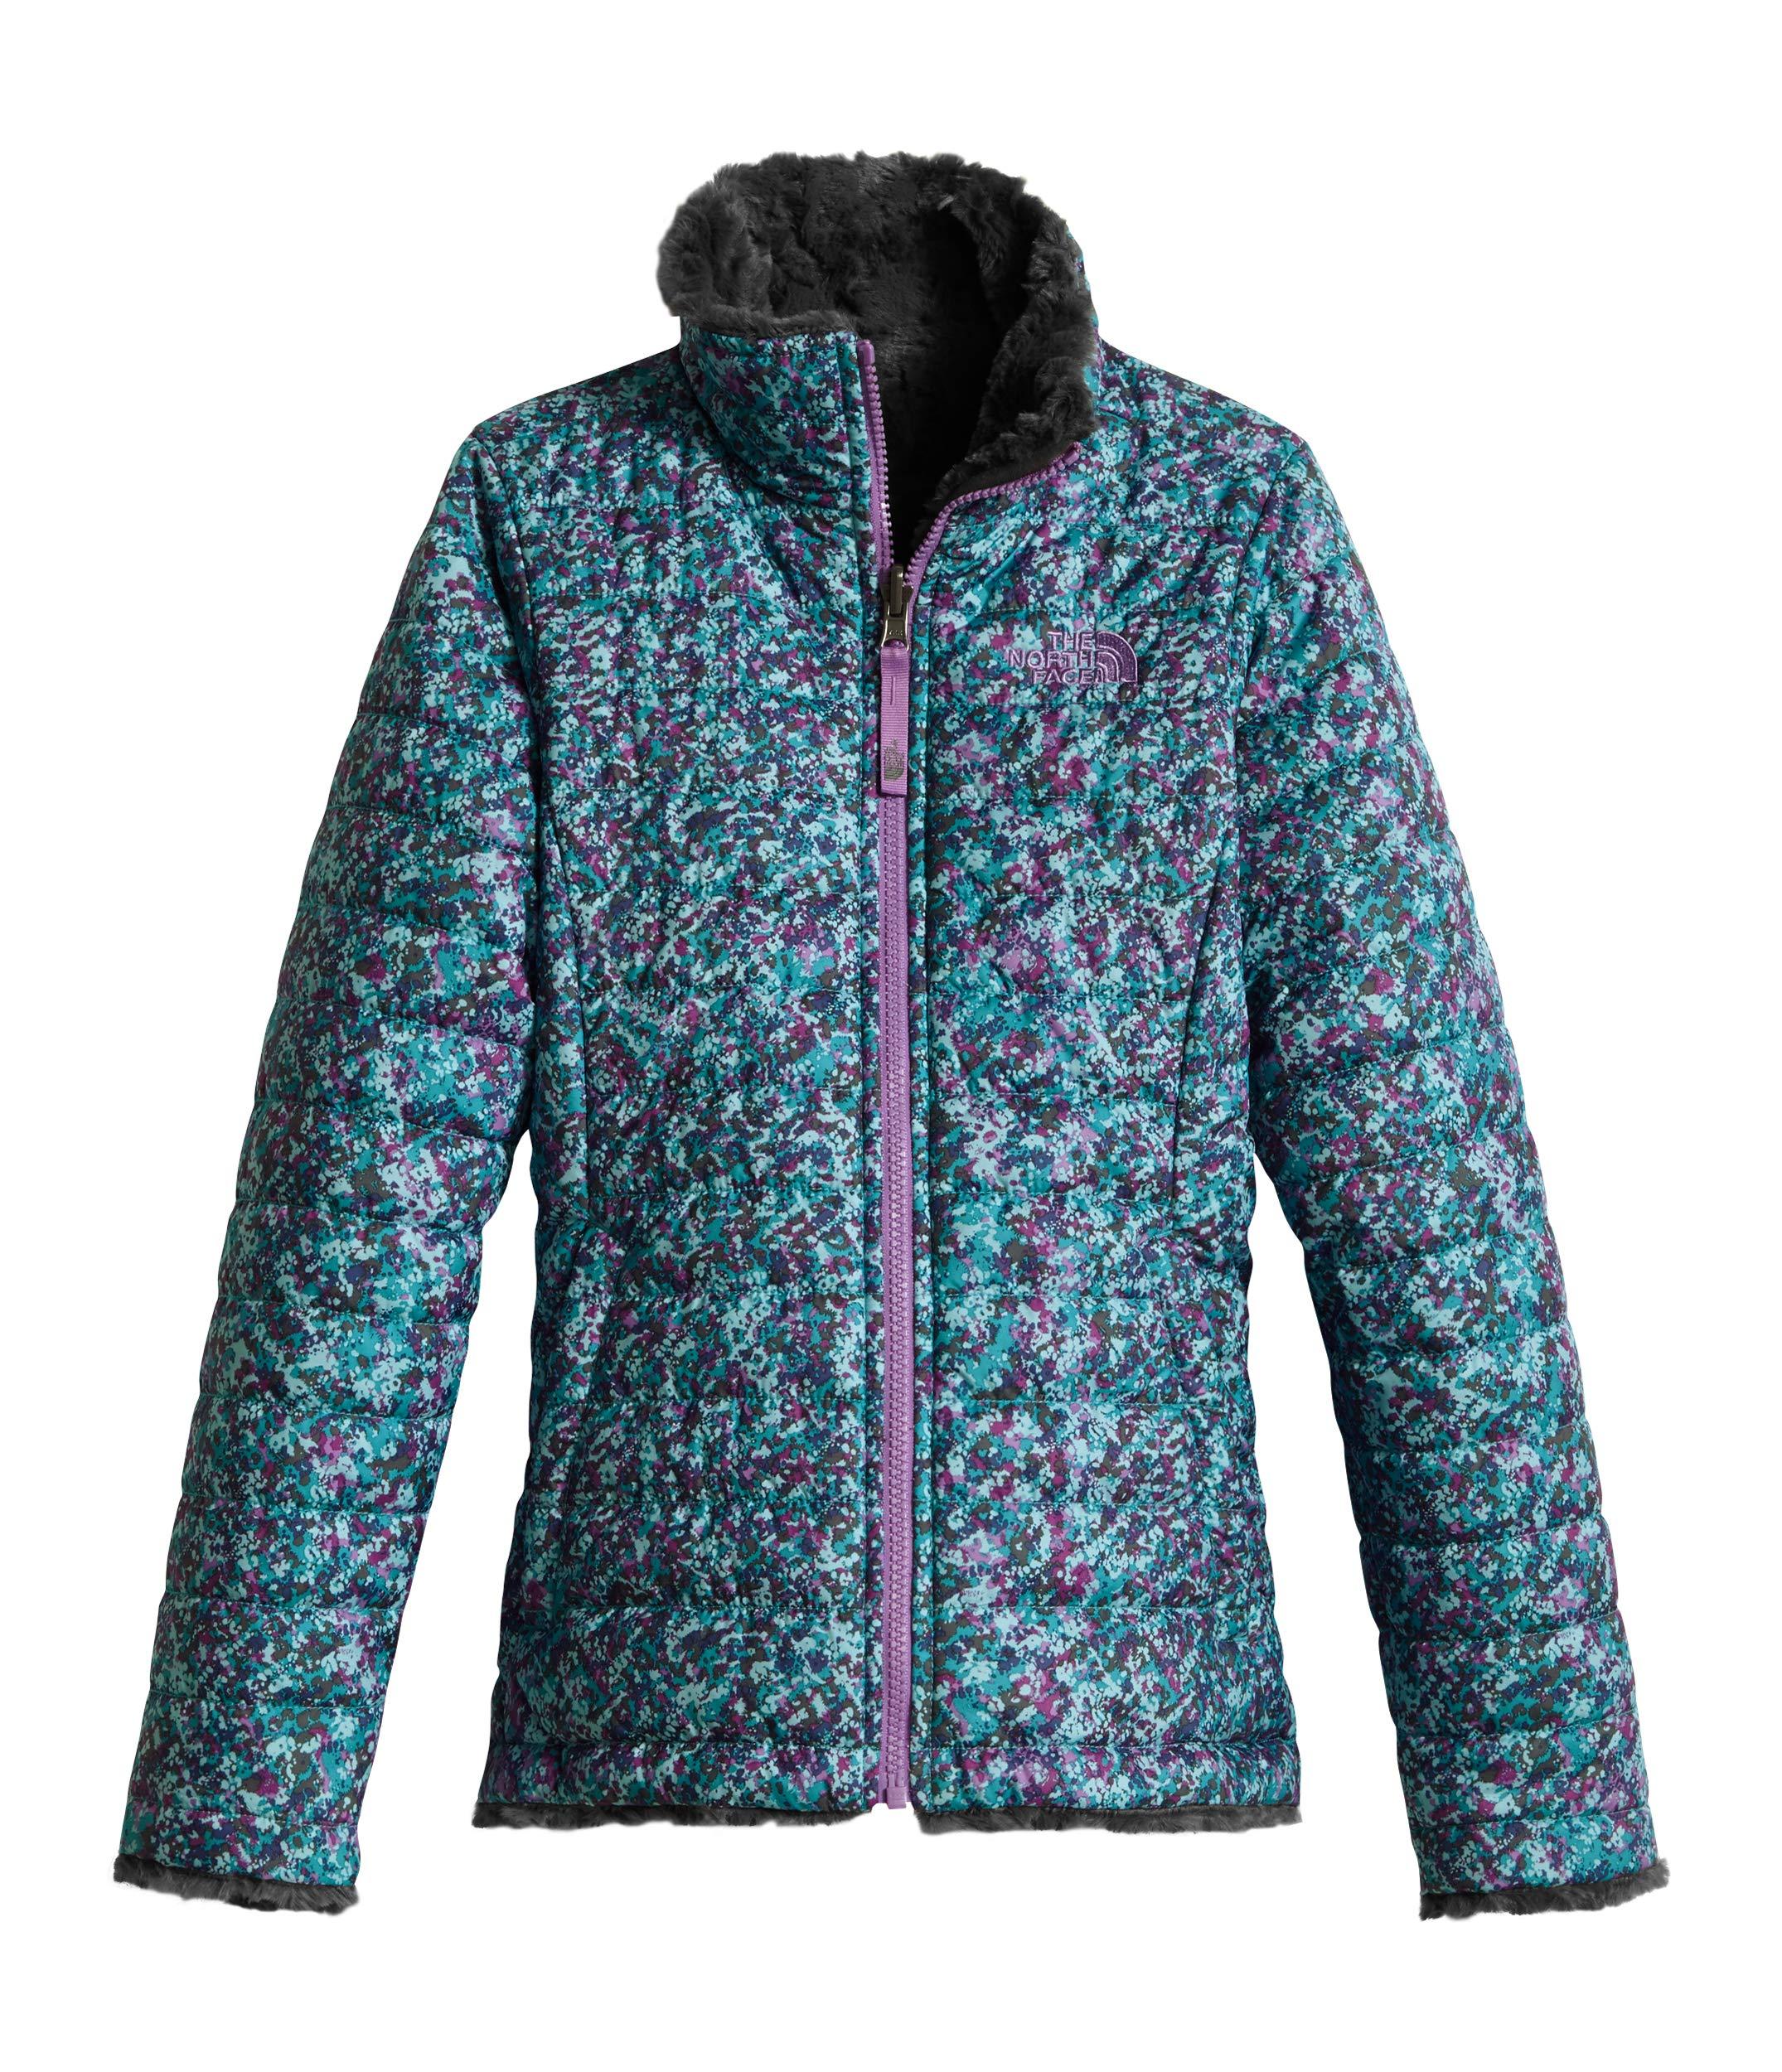 871ba4627b5 Galleon - The North Face Girl s Reversible Mossbud Swirl Jacket - Algiers  Blue Sponge Print - XS (Past Season)